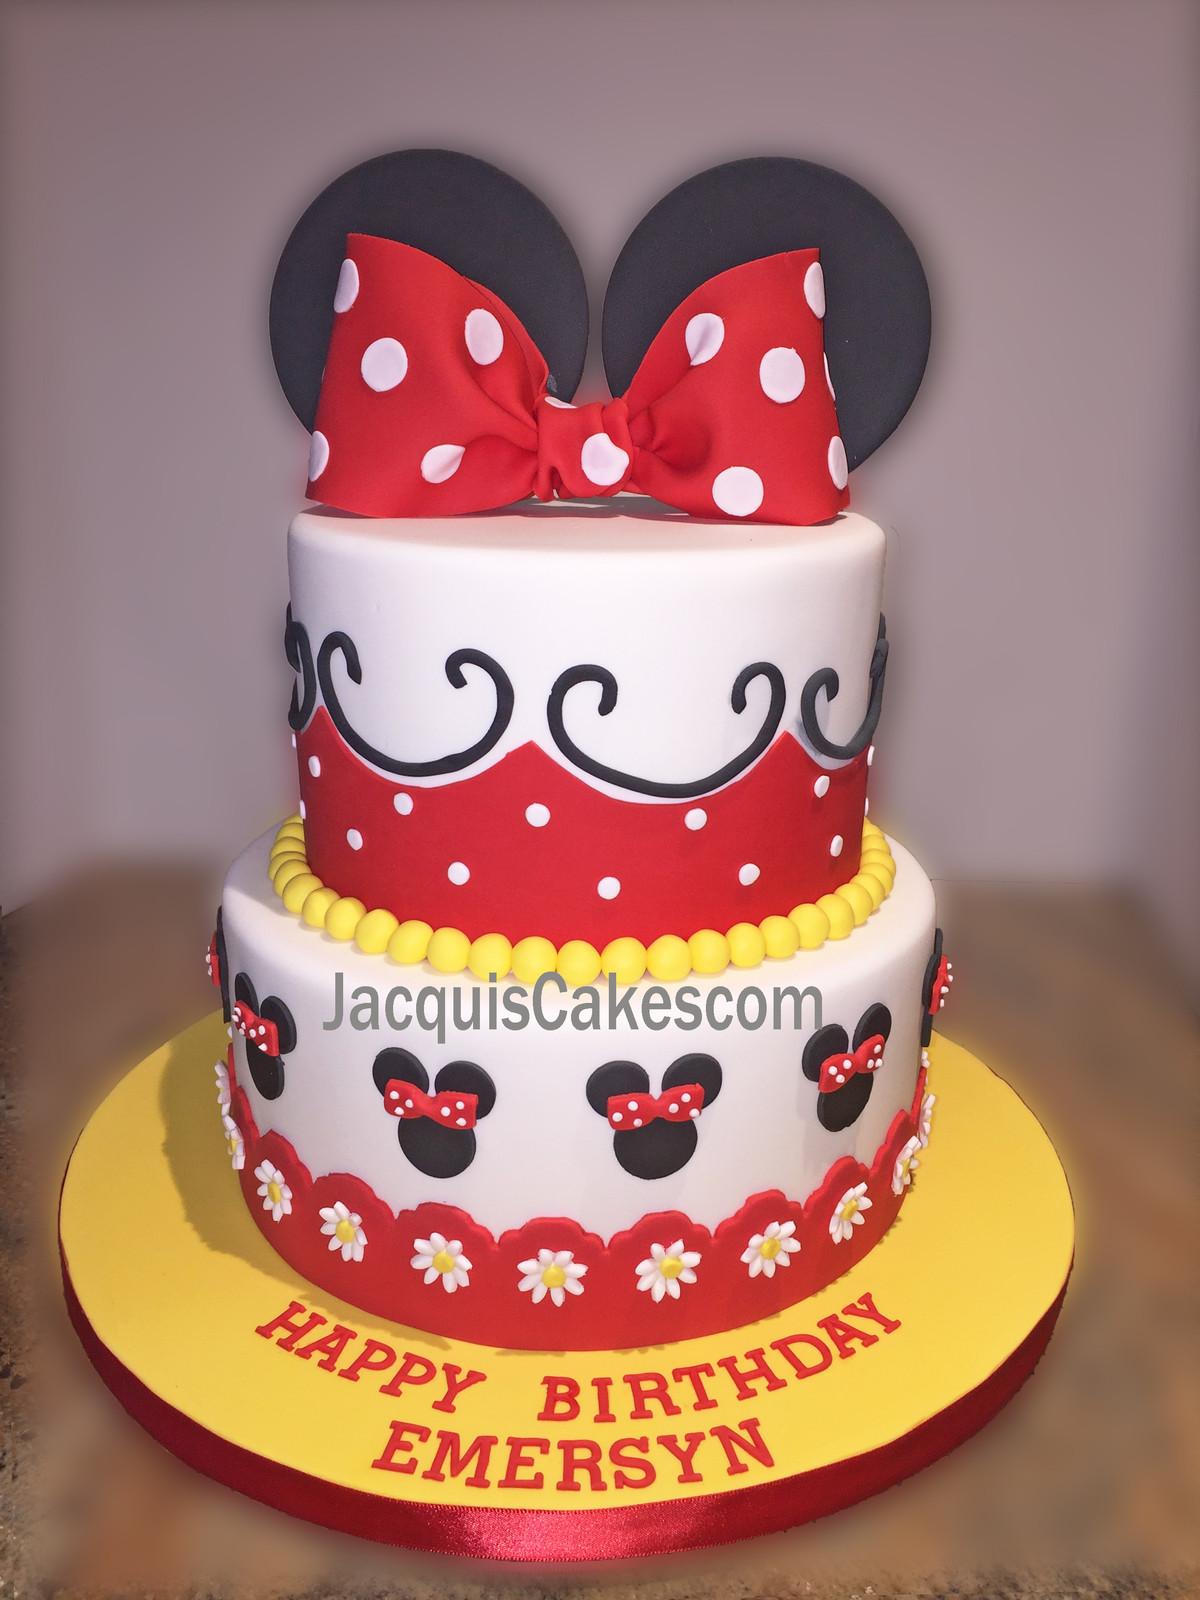 Birthday Cakes Bonney Lake WA Jacquis